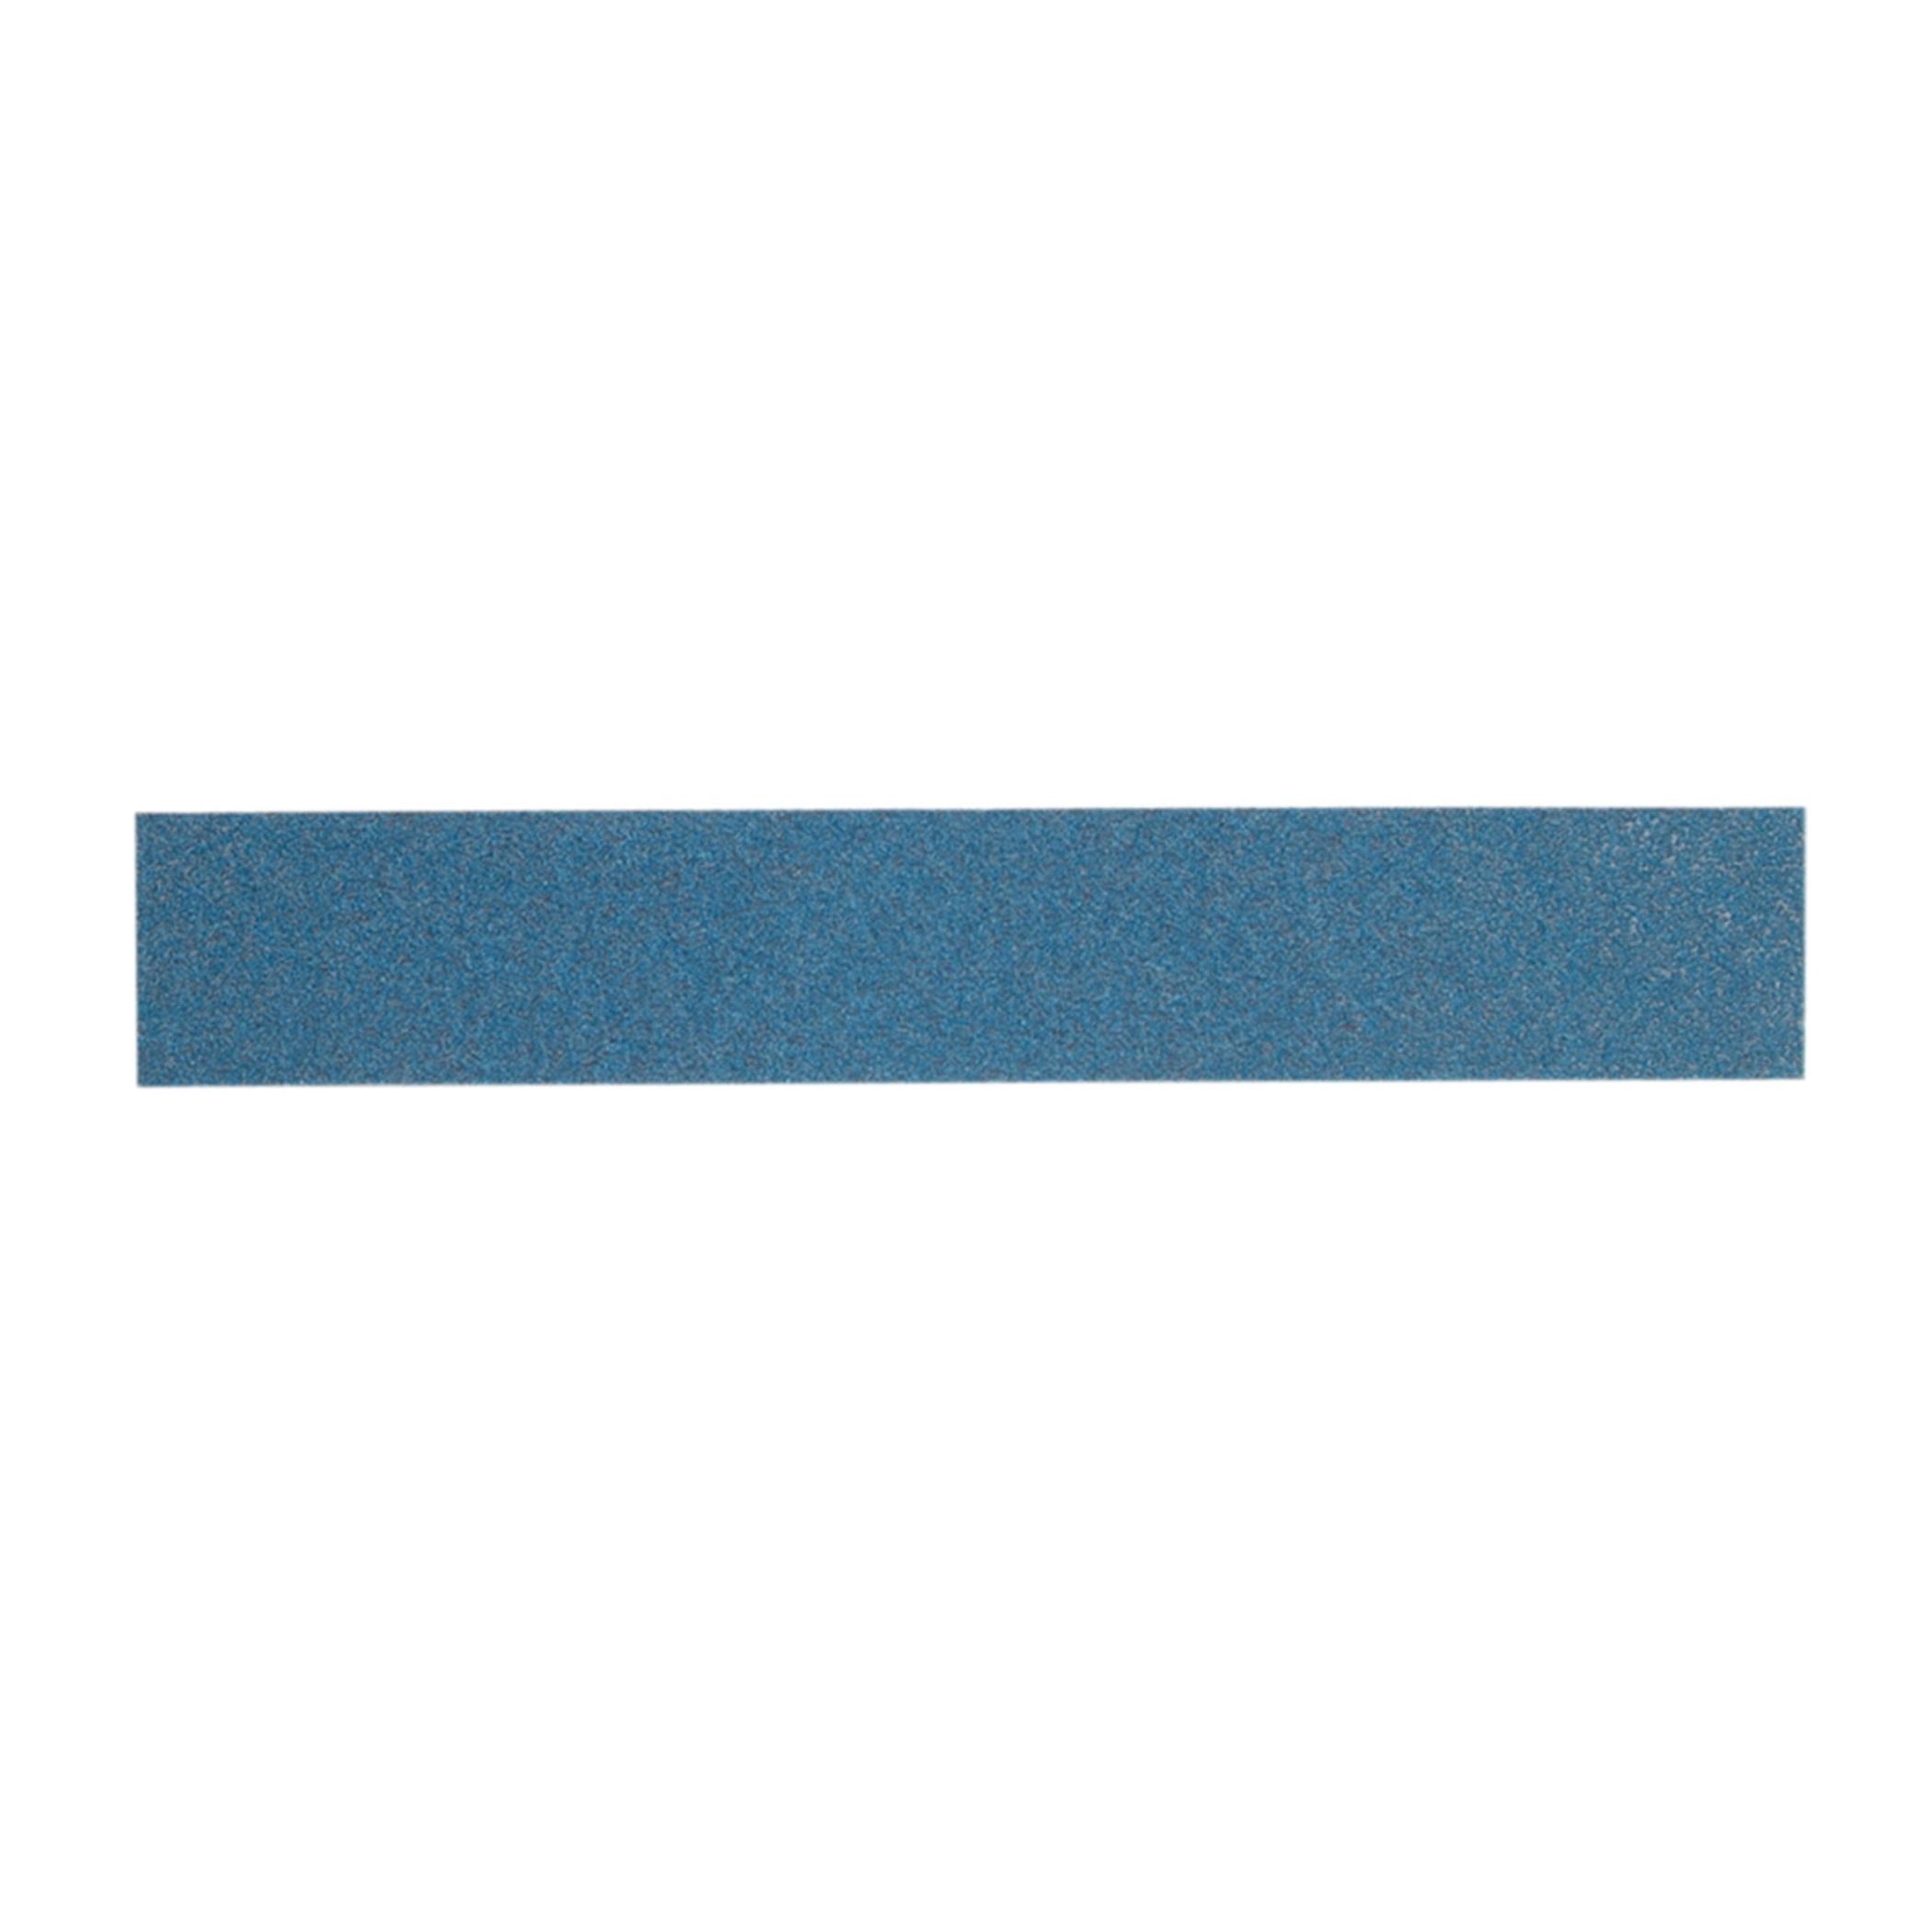 Norton® BlueFire® 66261126511 H875P Clip-On Non-PSA Coated File Strip, 17-1/2 in L x 2-3/4 in W, 180 Grit, Fine Grade, Zirconia Alumina Abrasive, Paper Backing